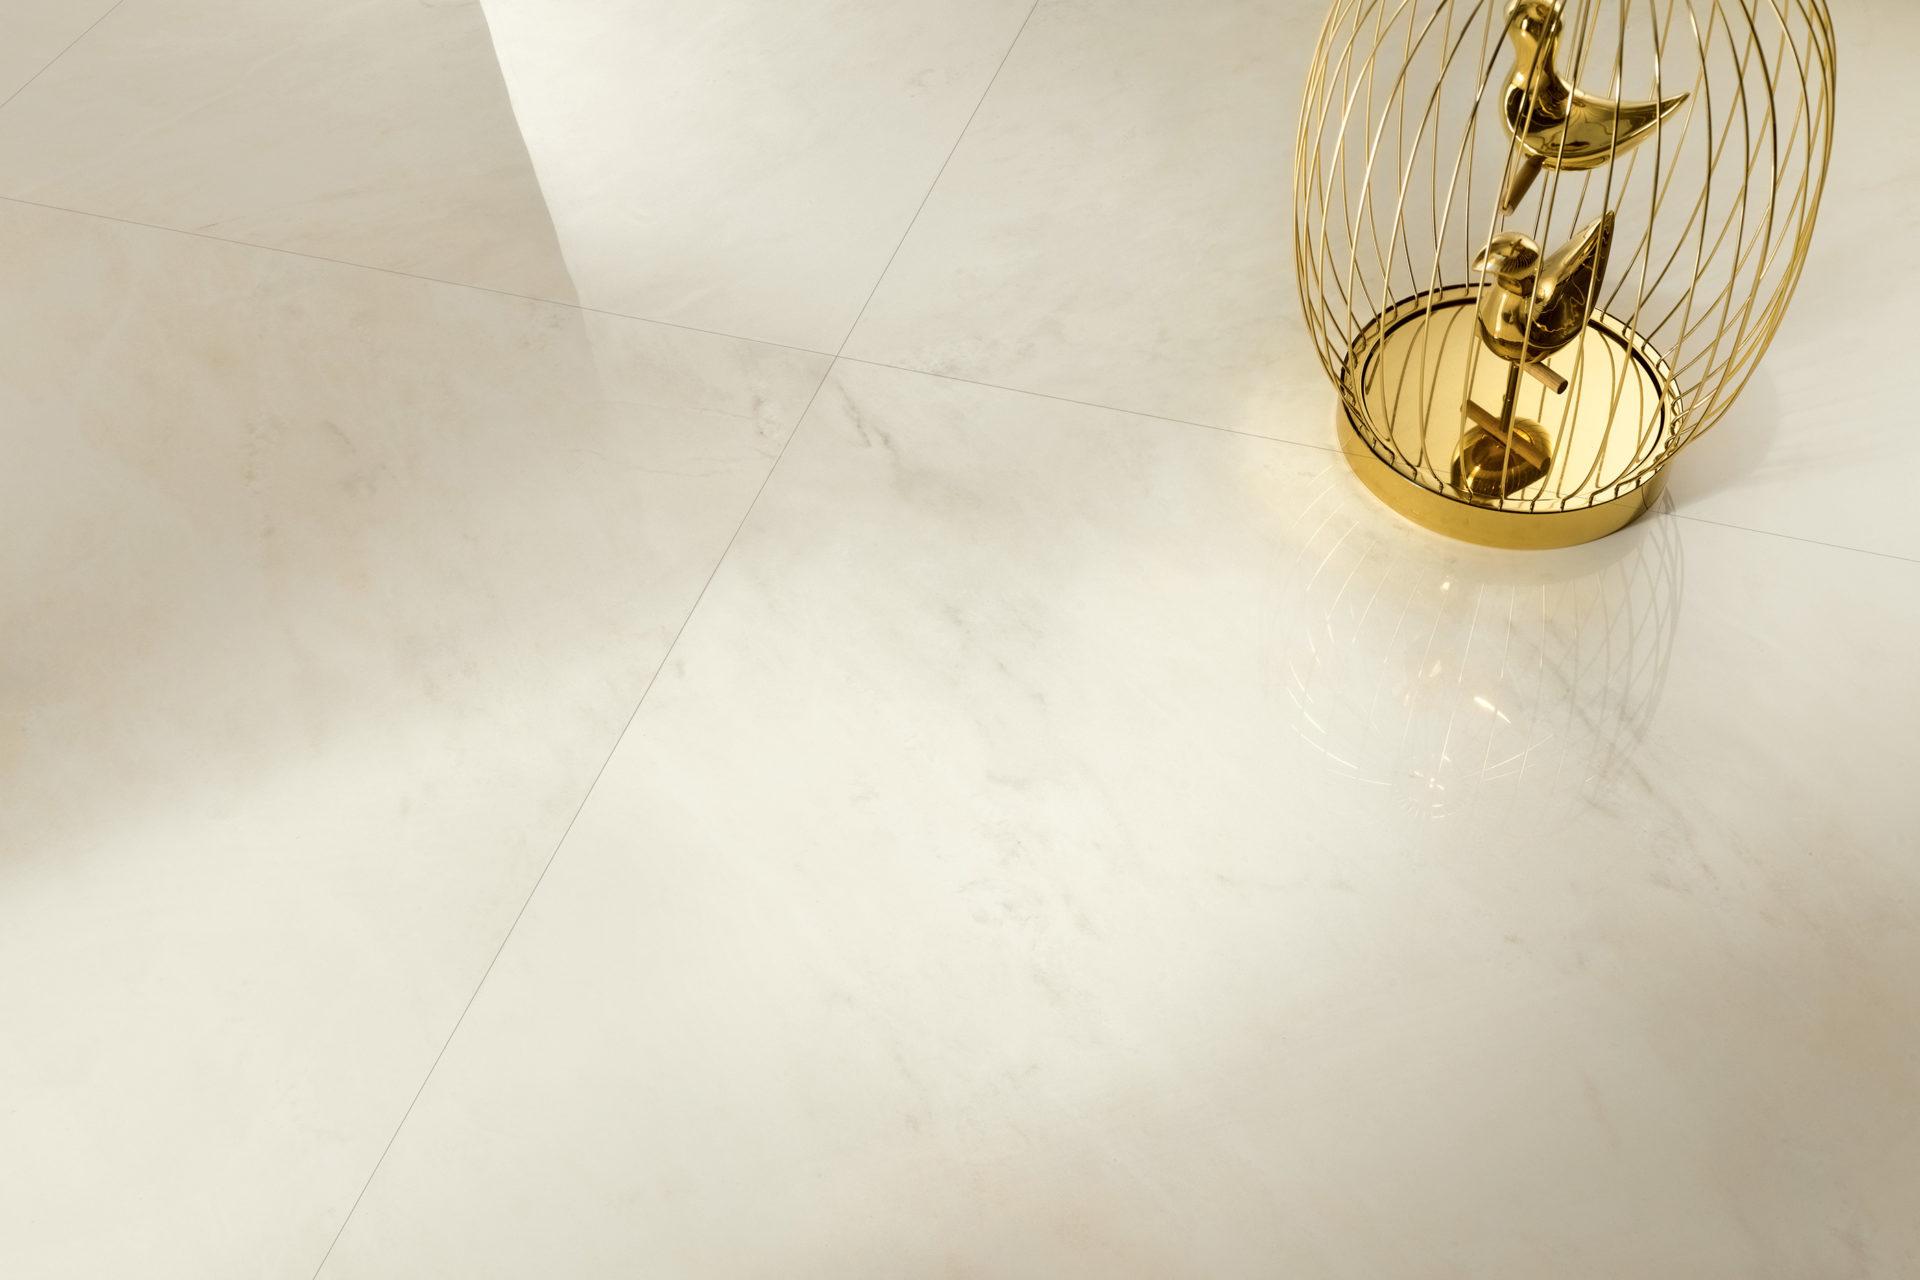 Gres sottile 3,5mm Effetto marmo - Kerlite